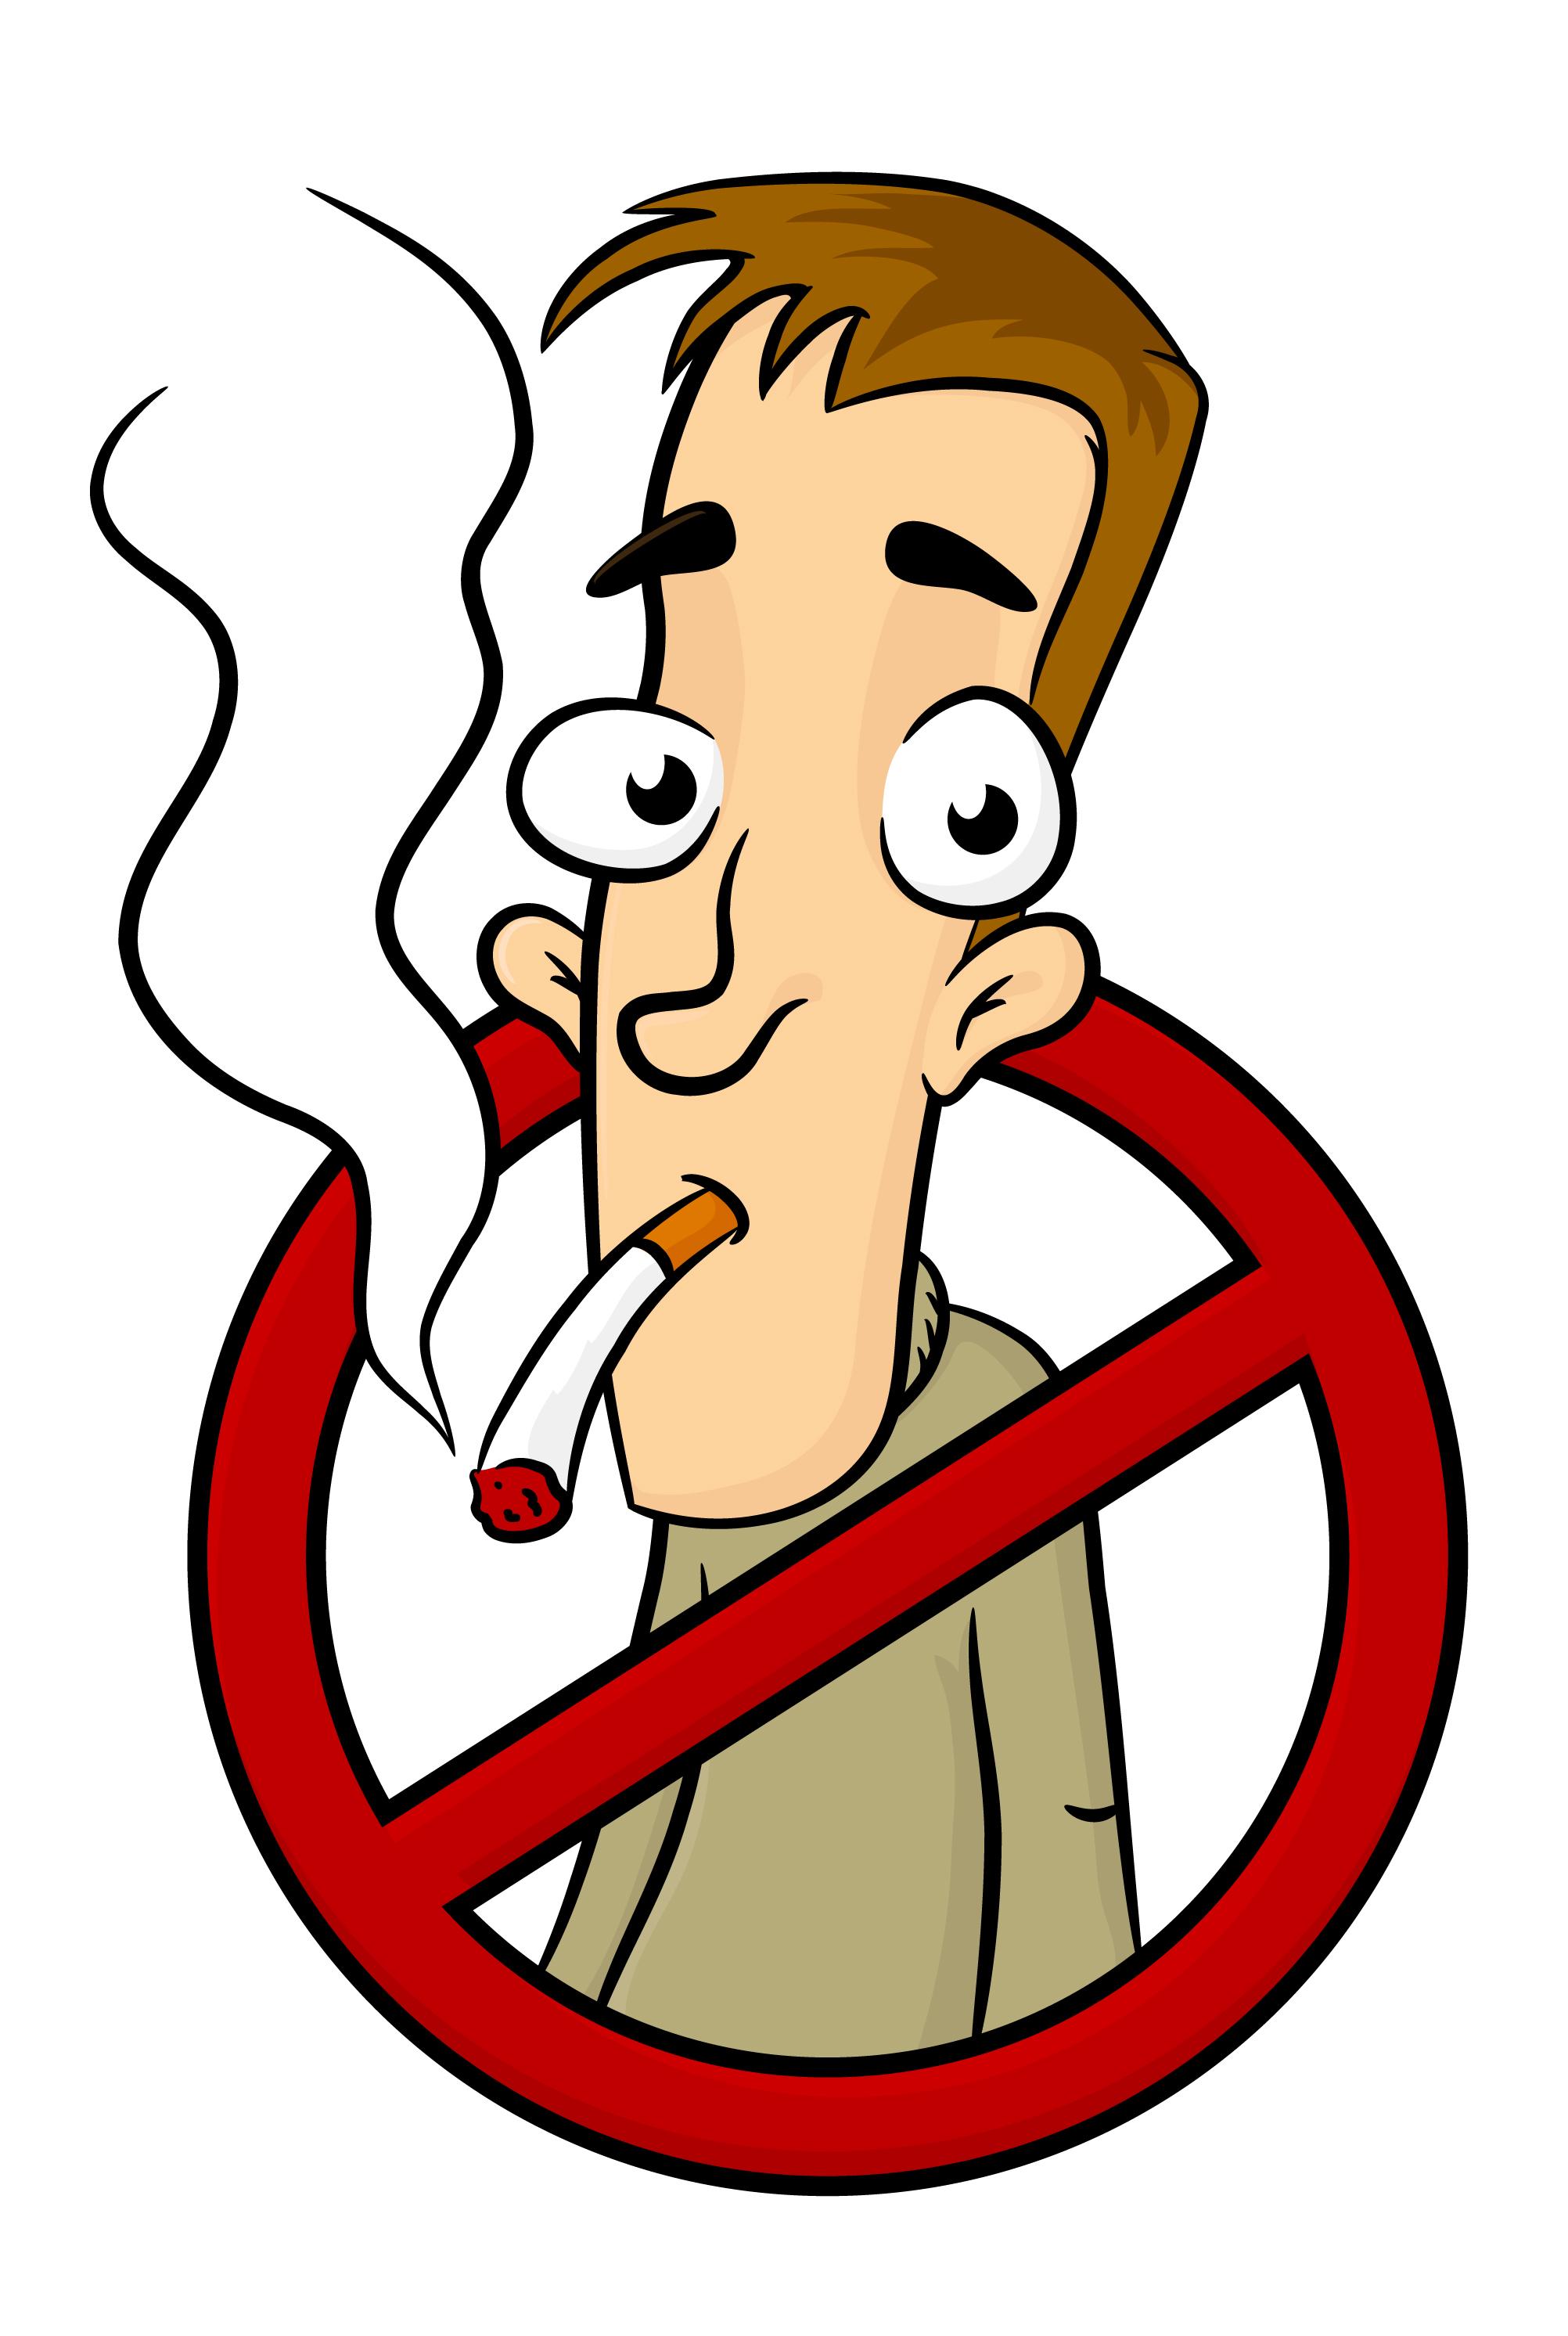 2004x2985 Kick Clip Art Smoking Cliparts